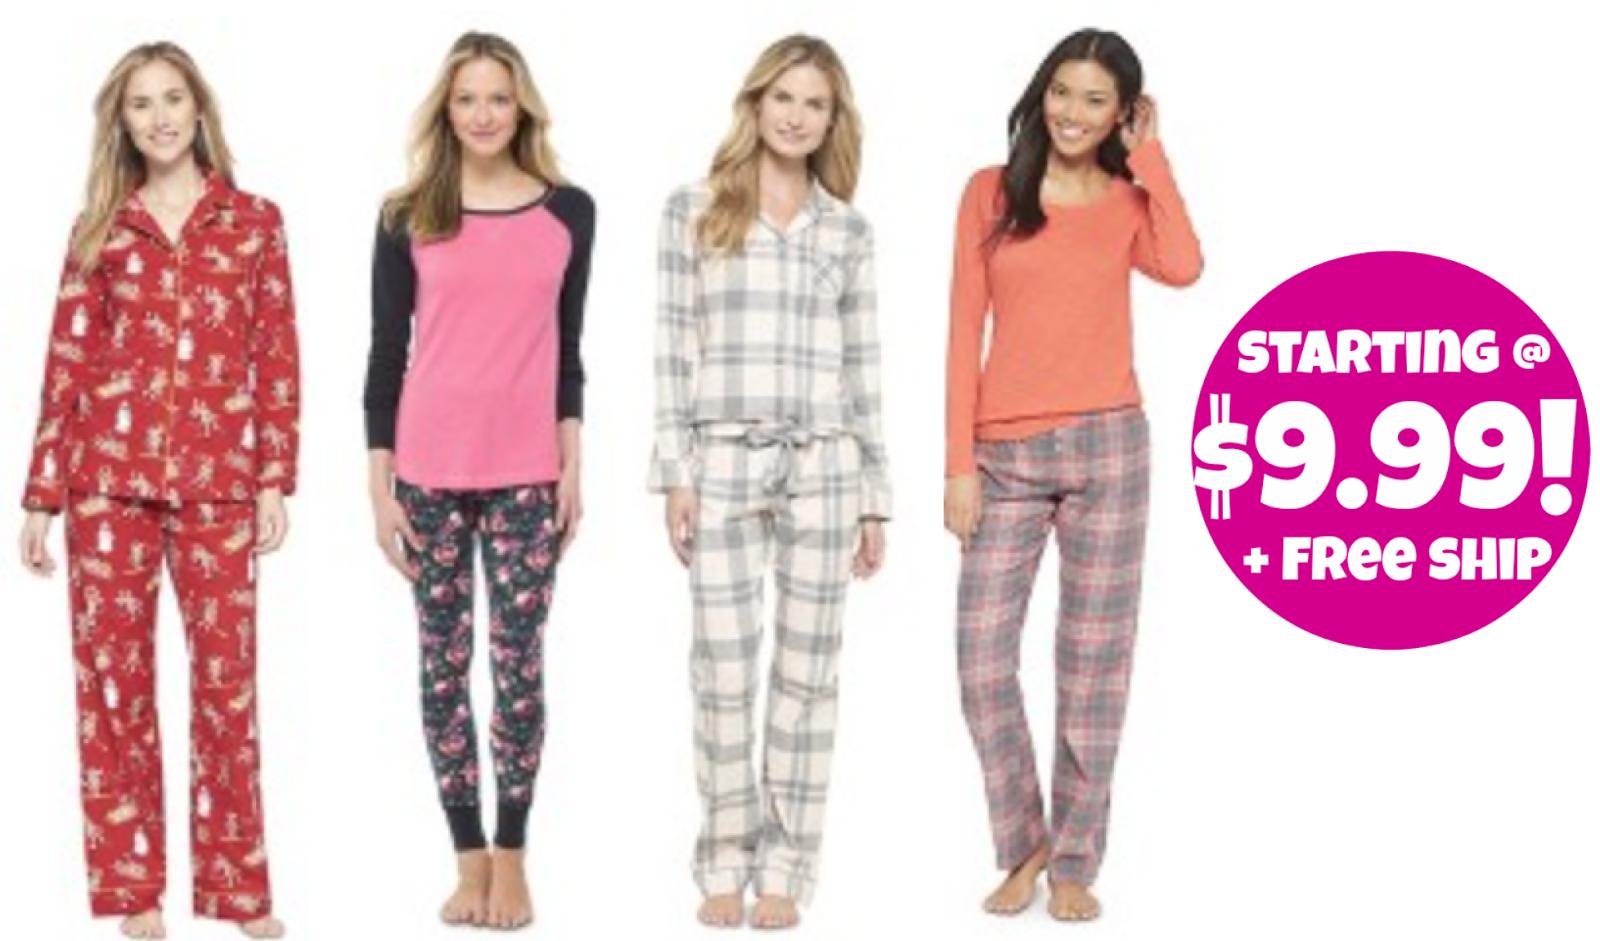 http://www.thebinderladies.com/2014/12/target-com-up-to-50-off-womens-pajama.html#.VIi-Z4fduyM